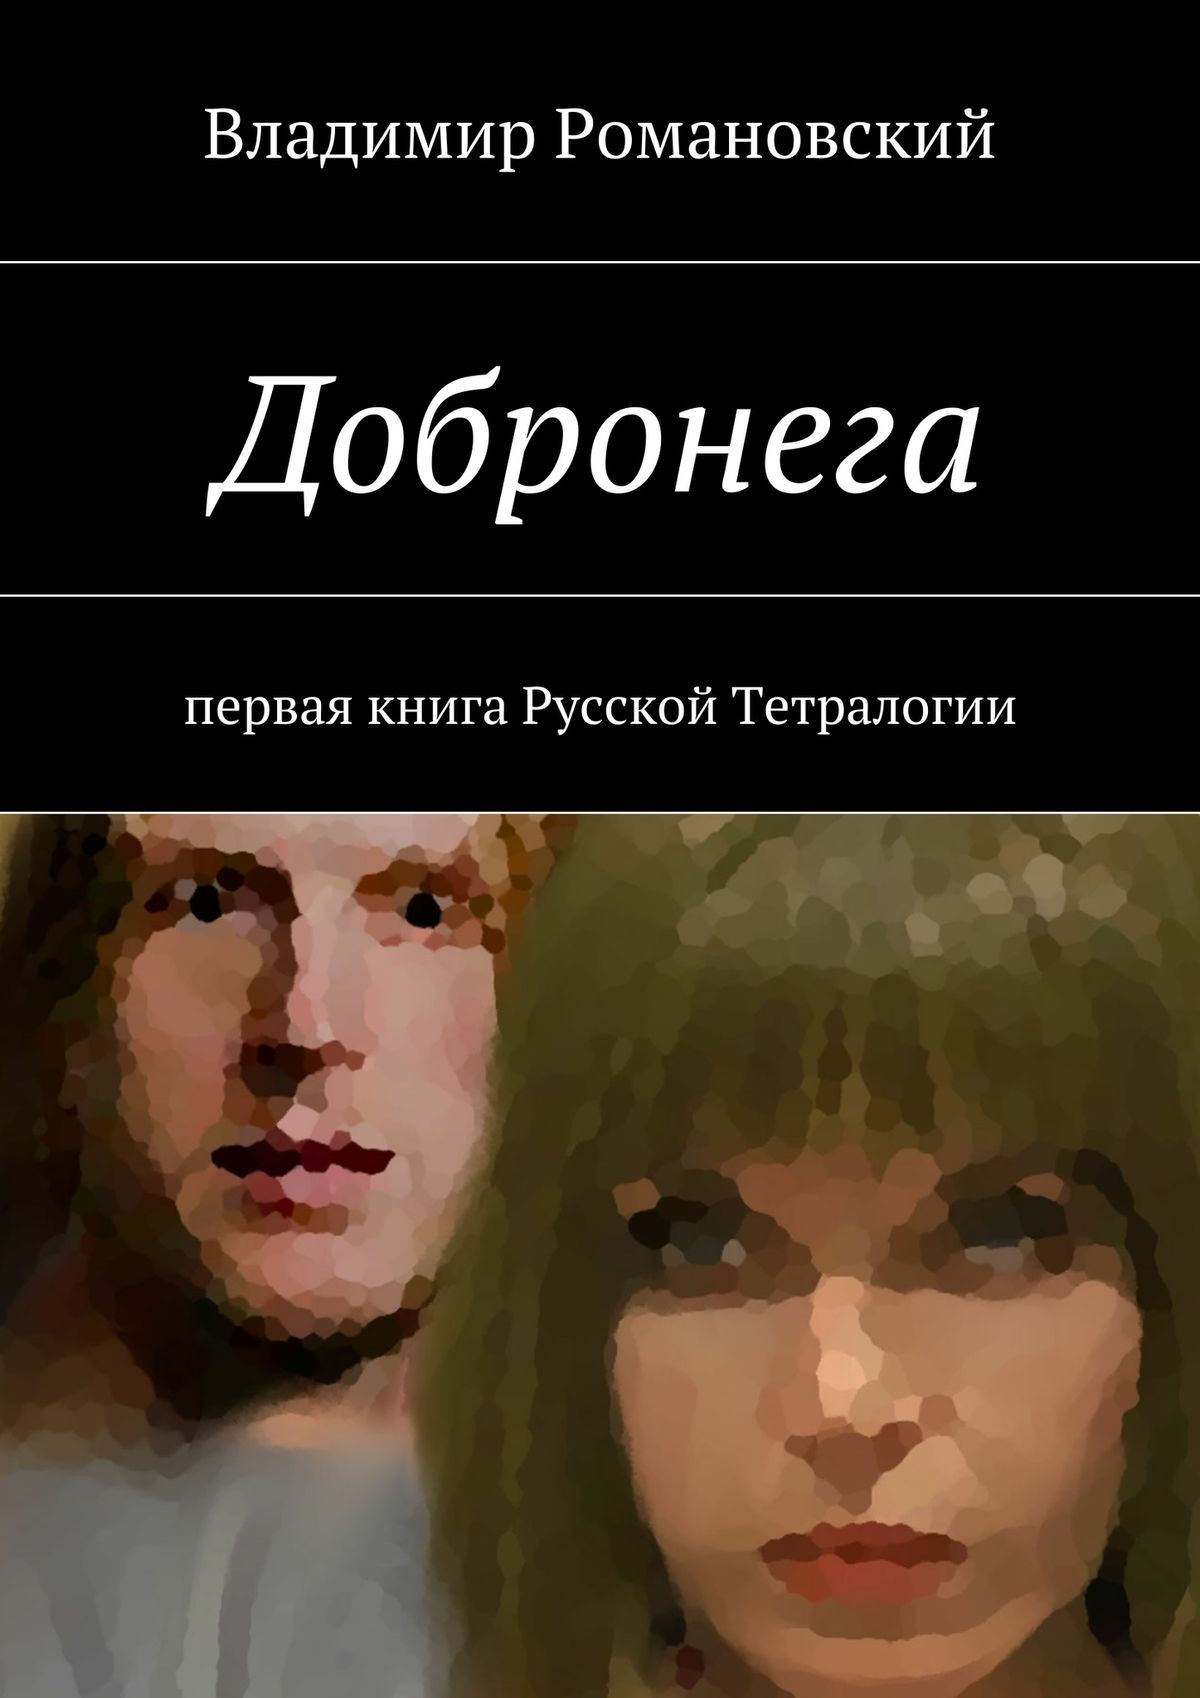 Владимир Романовский «Добронега»